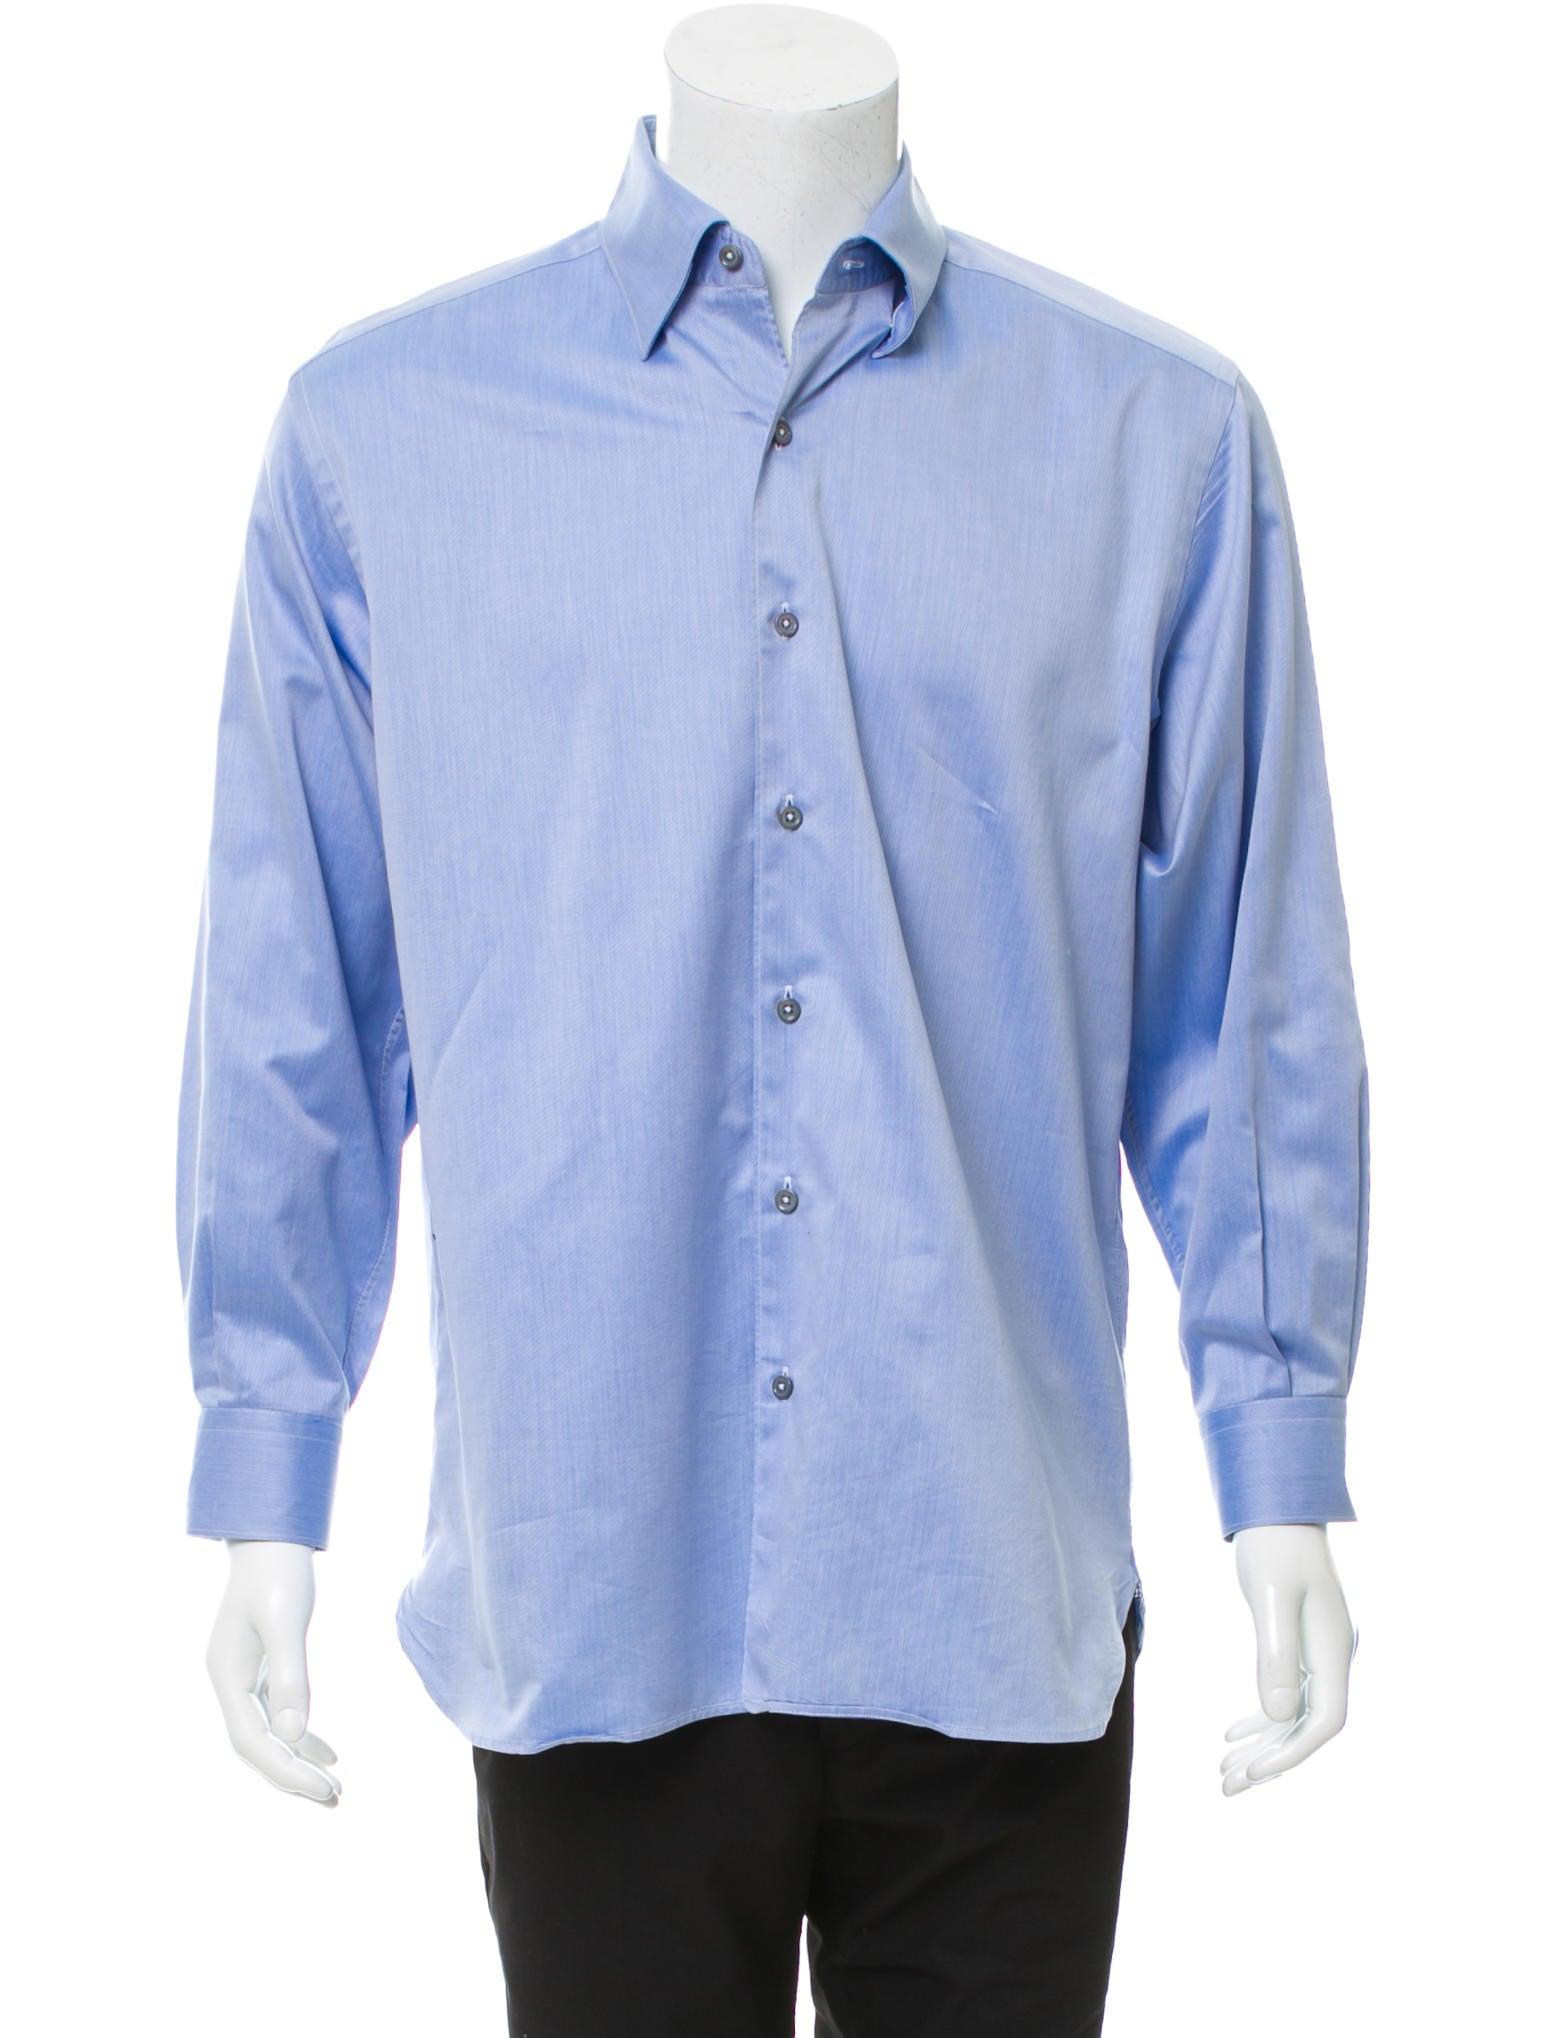 ermenegildo zegna woven button up shirt clothing zgn25288 the realreal. Black Bedroom Furniture Sets. Home Design Ideas